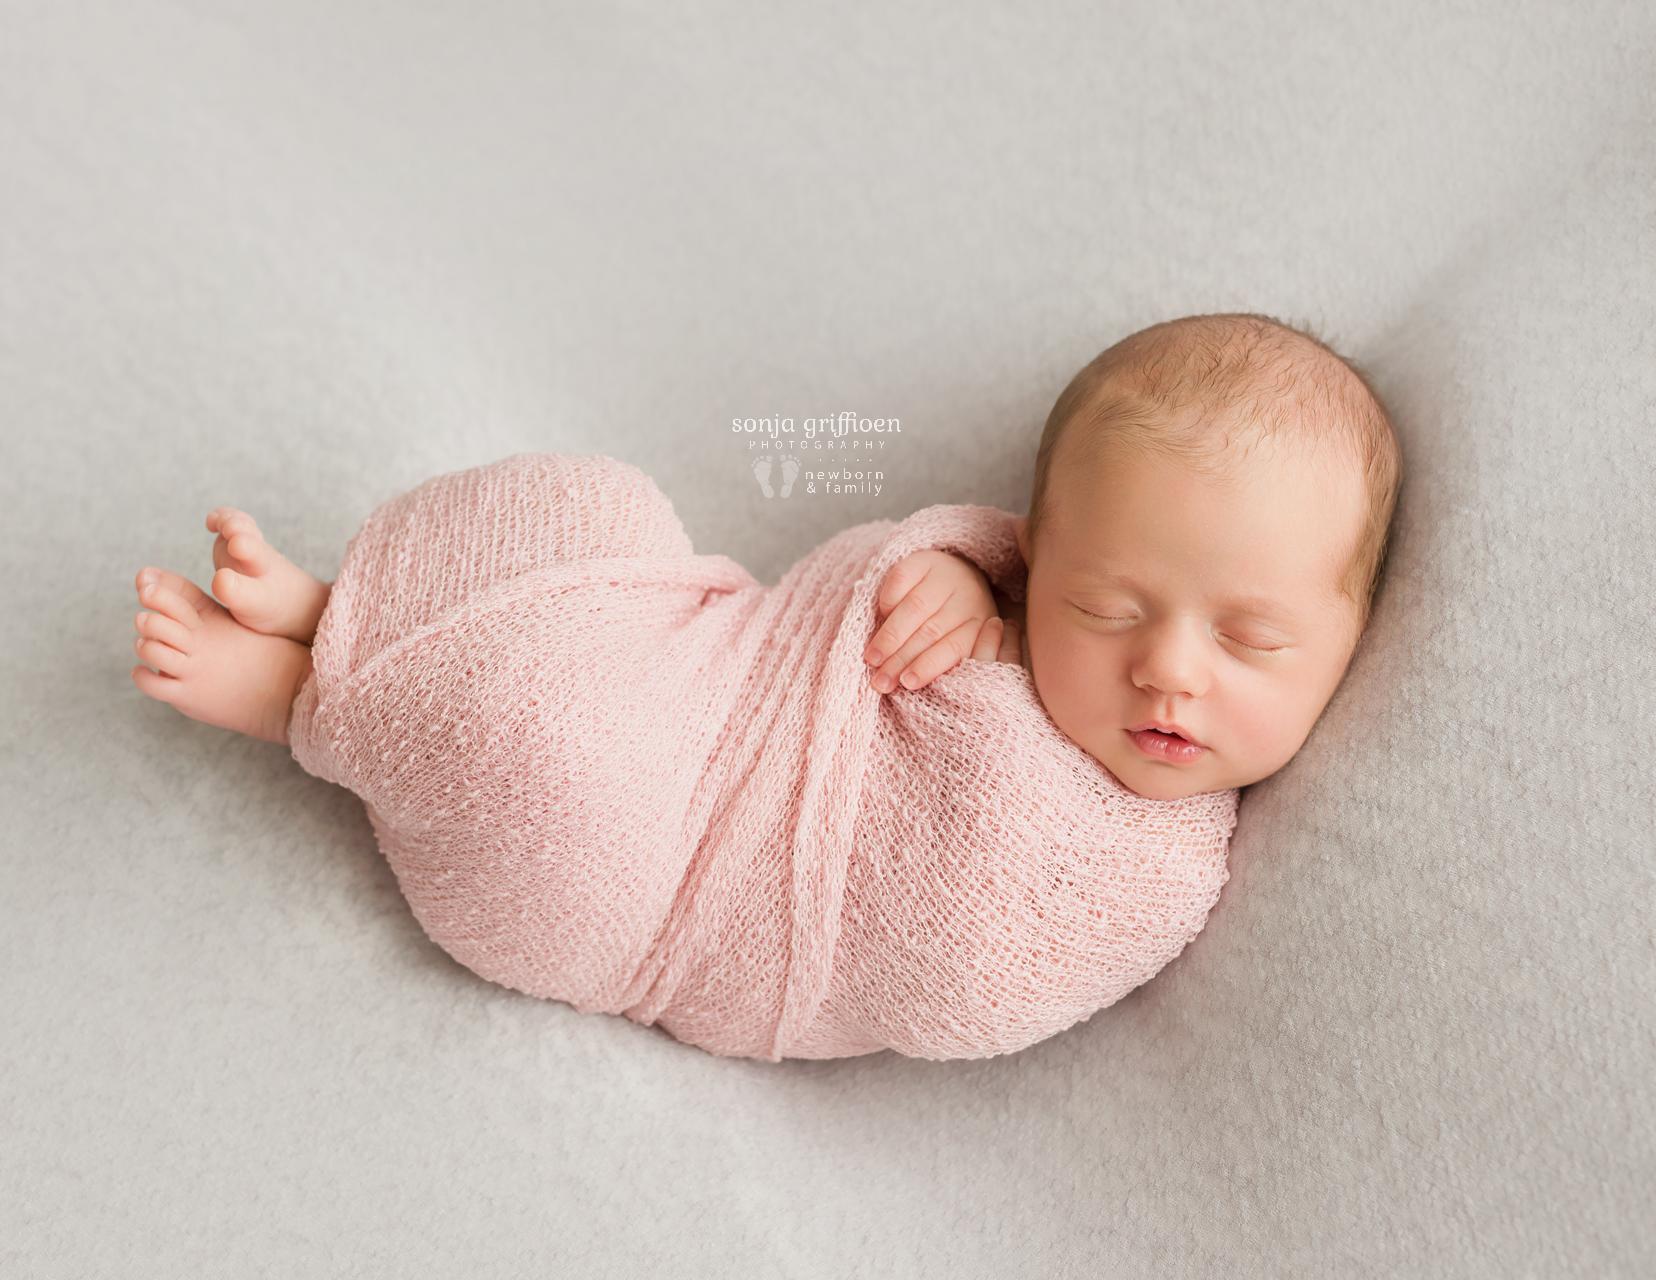 Veronica-Newborn-Brisbane-Newborn-Photographer-Sonja-Griffioen-09.jpg